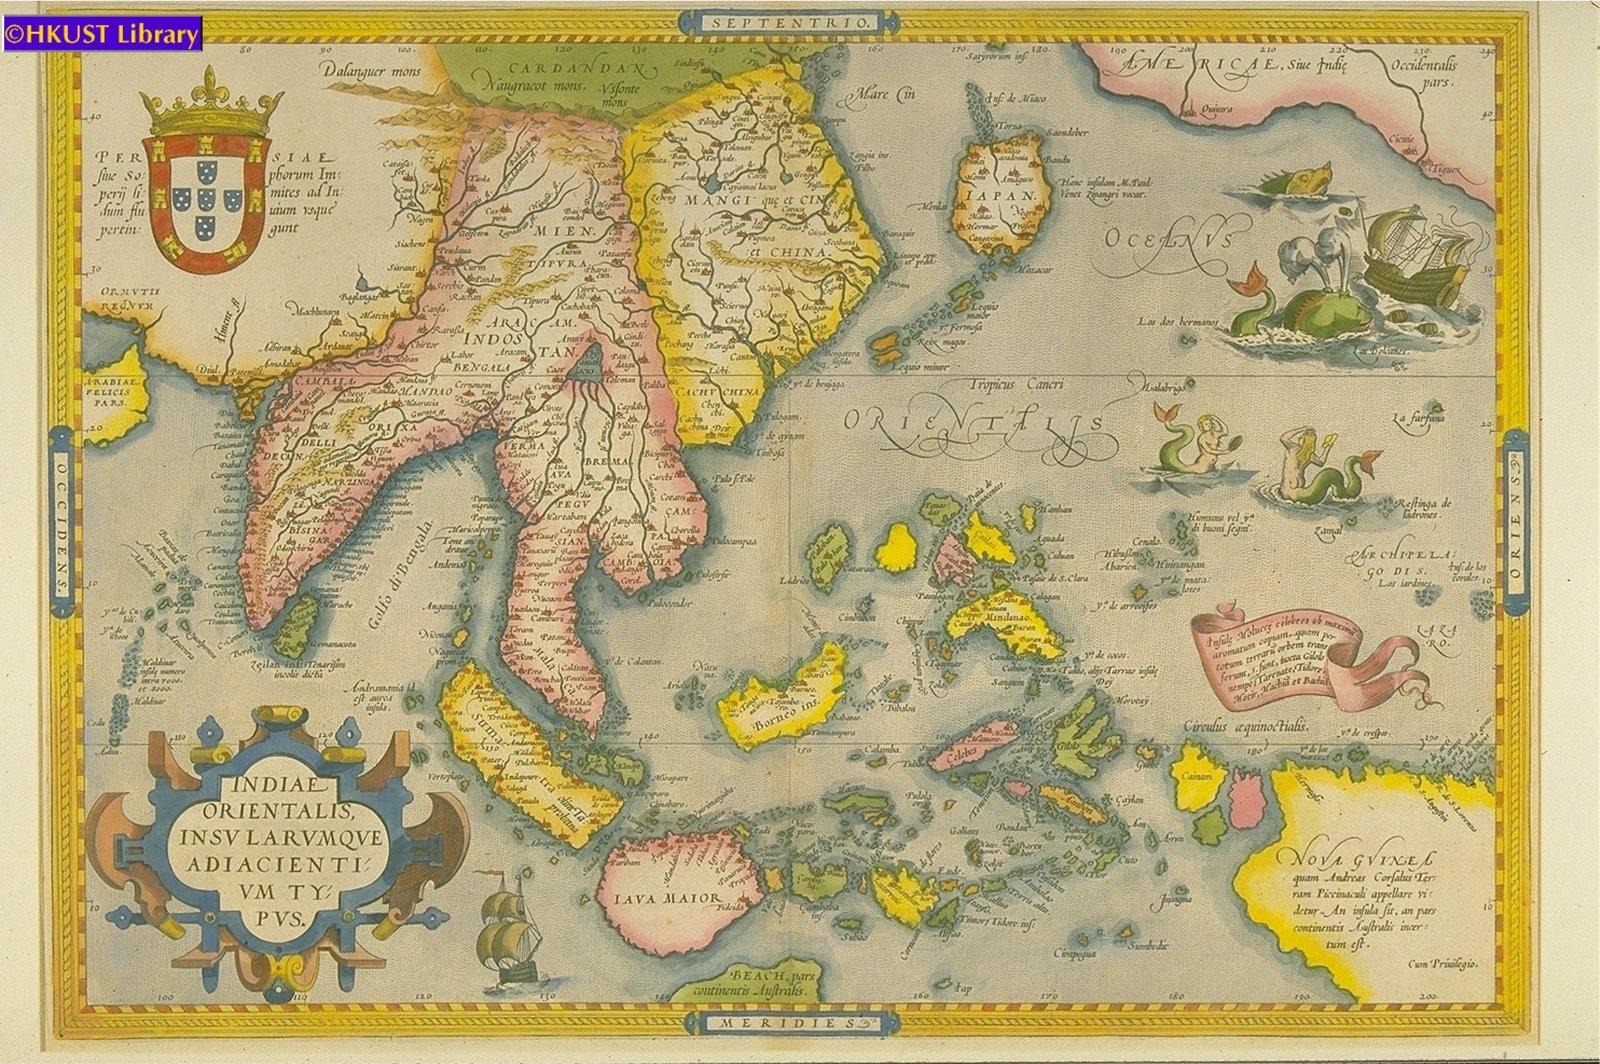 [Abraham+Ortelius+1570+from+HKUST.jpg]